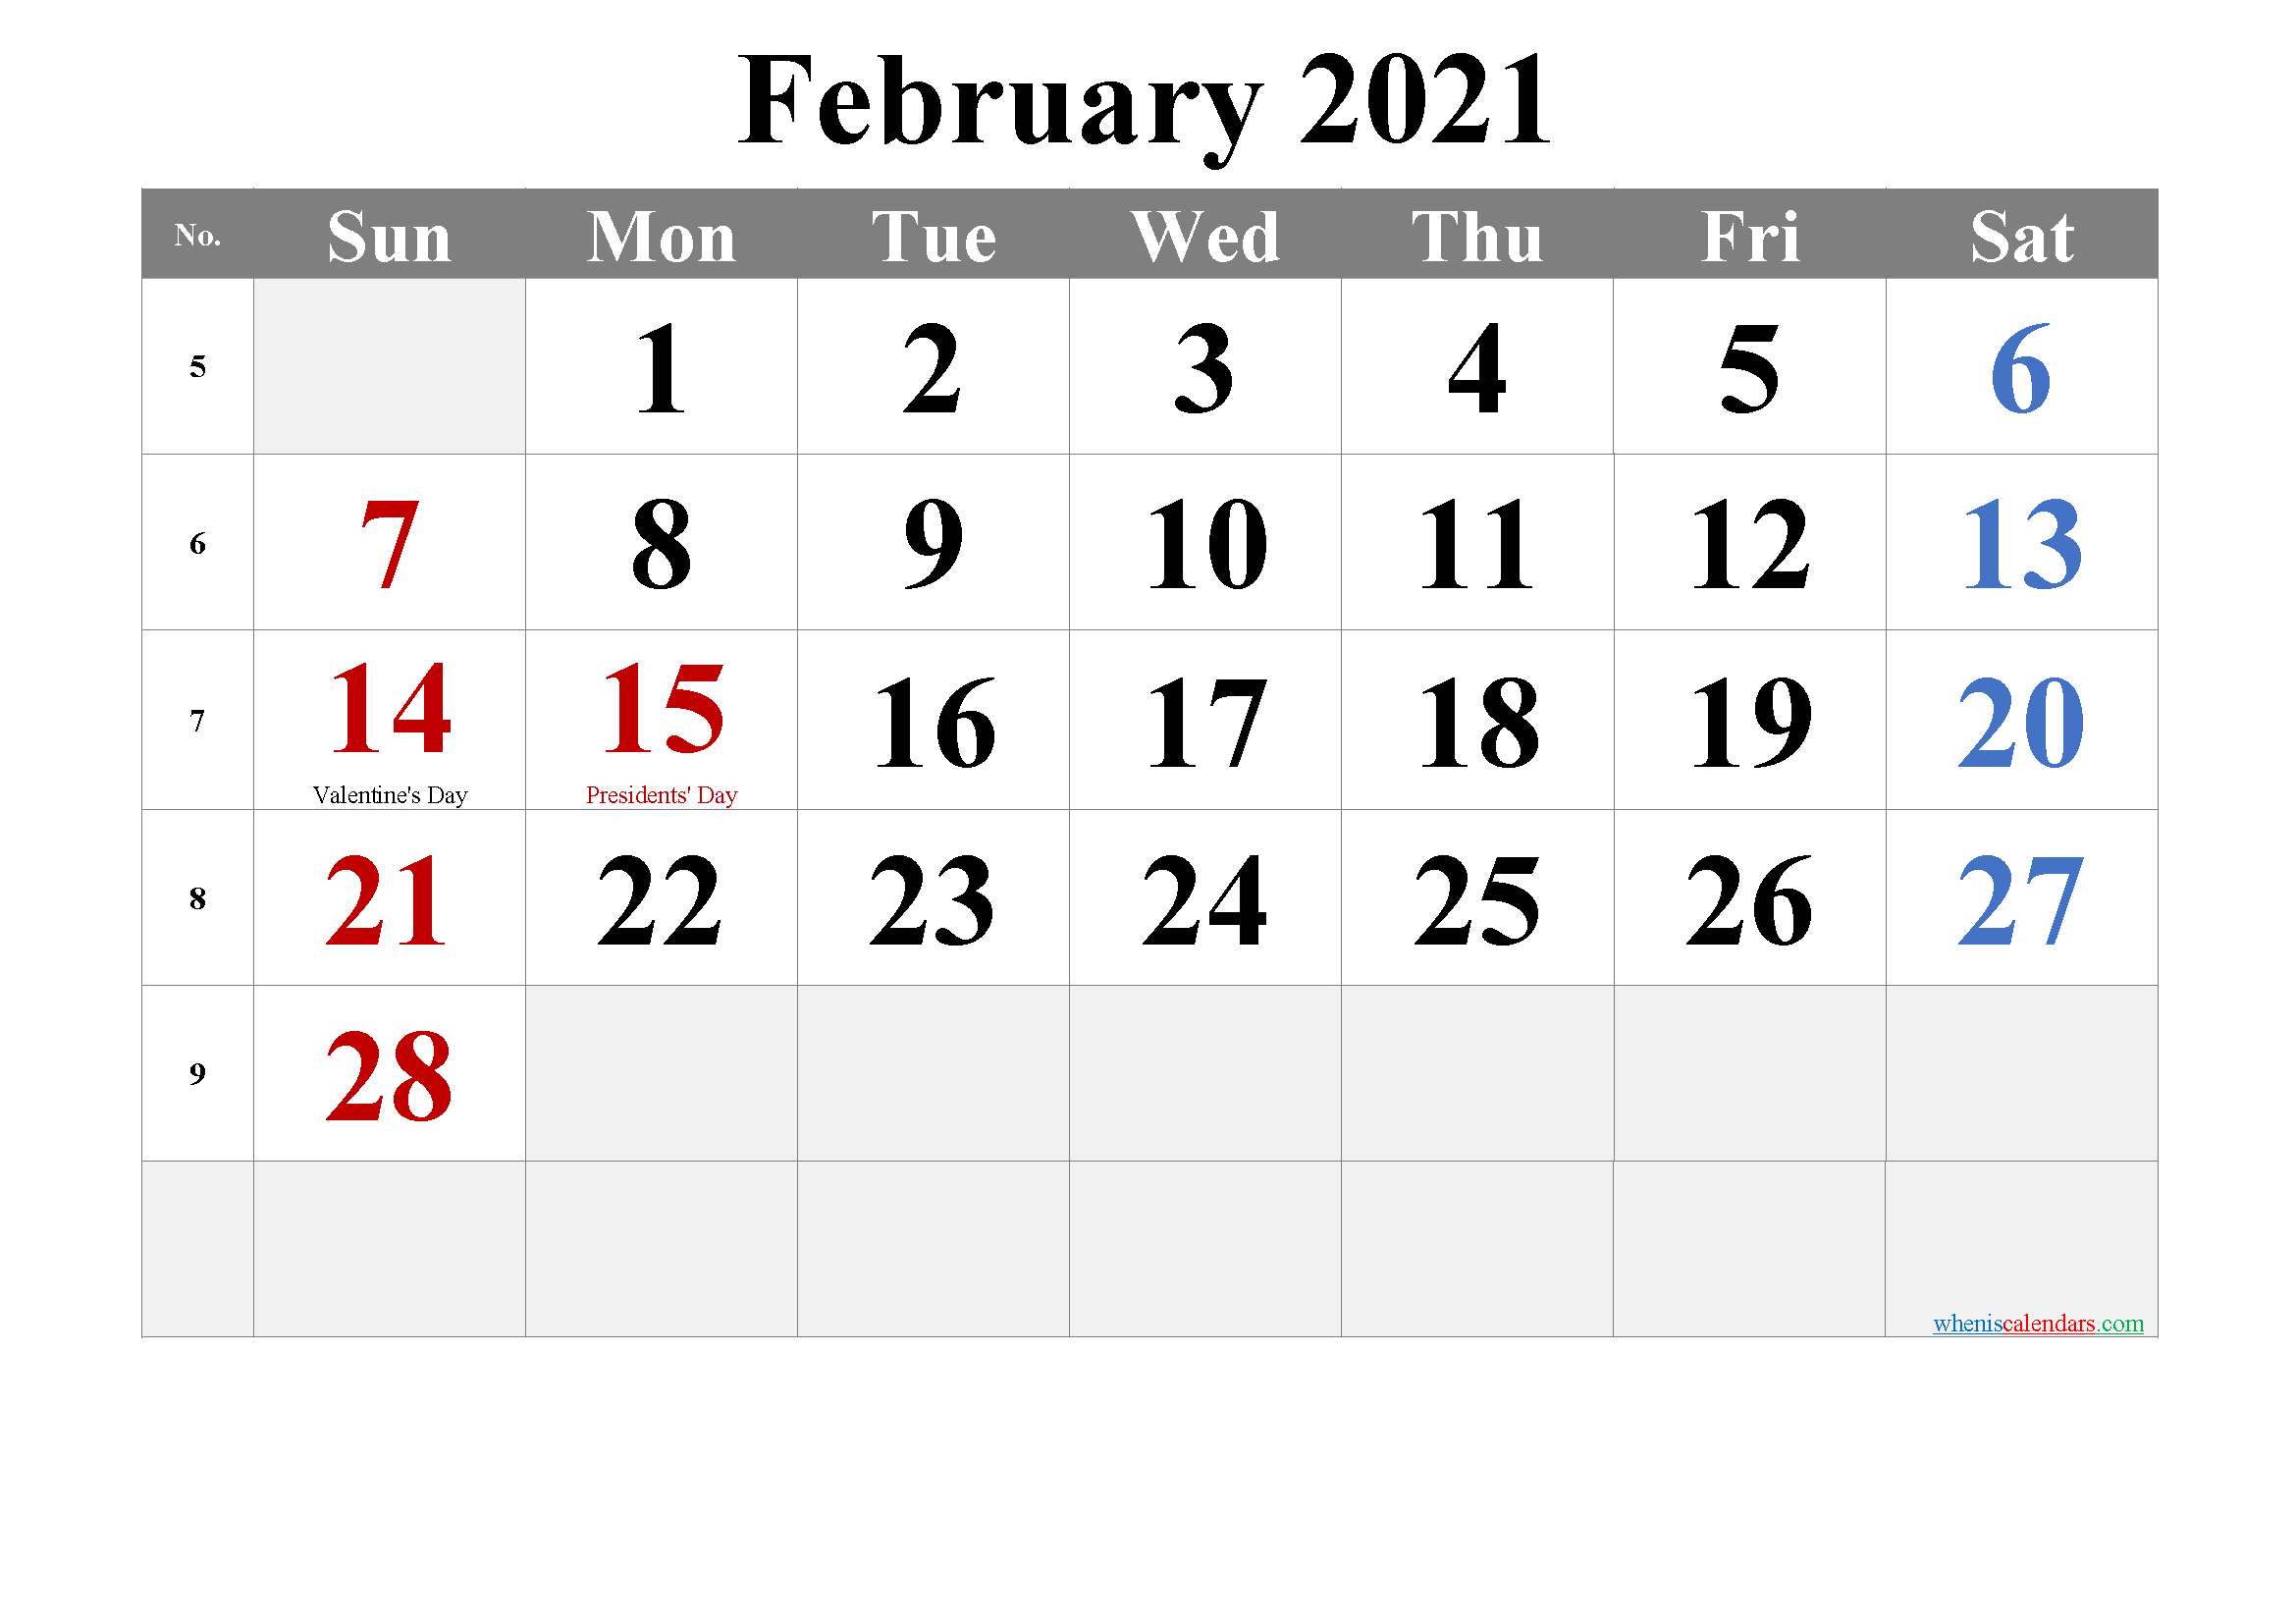 Free Printable February 2021 Calendar with Holidays